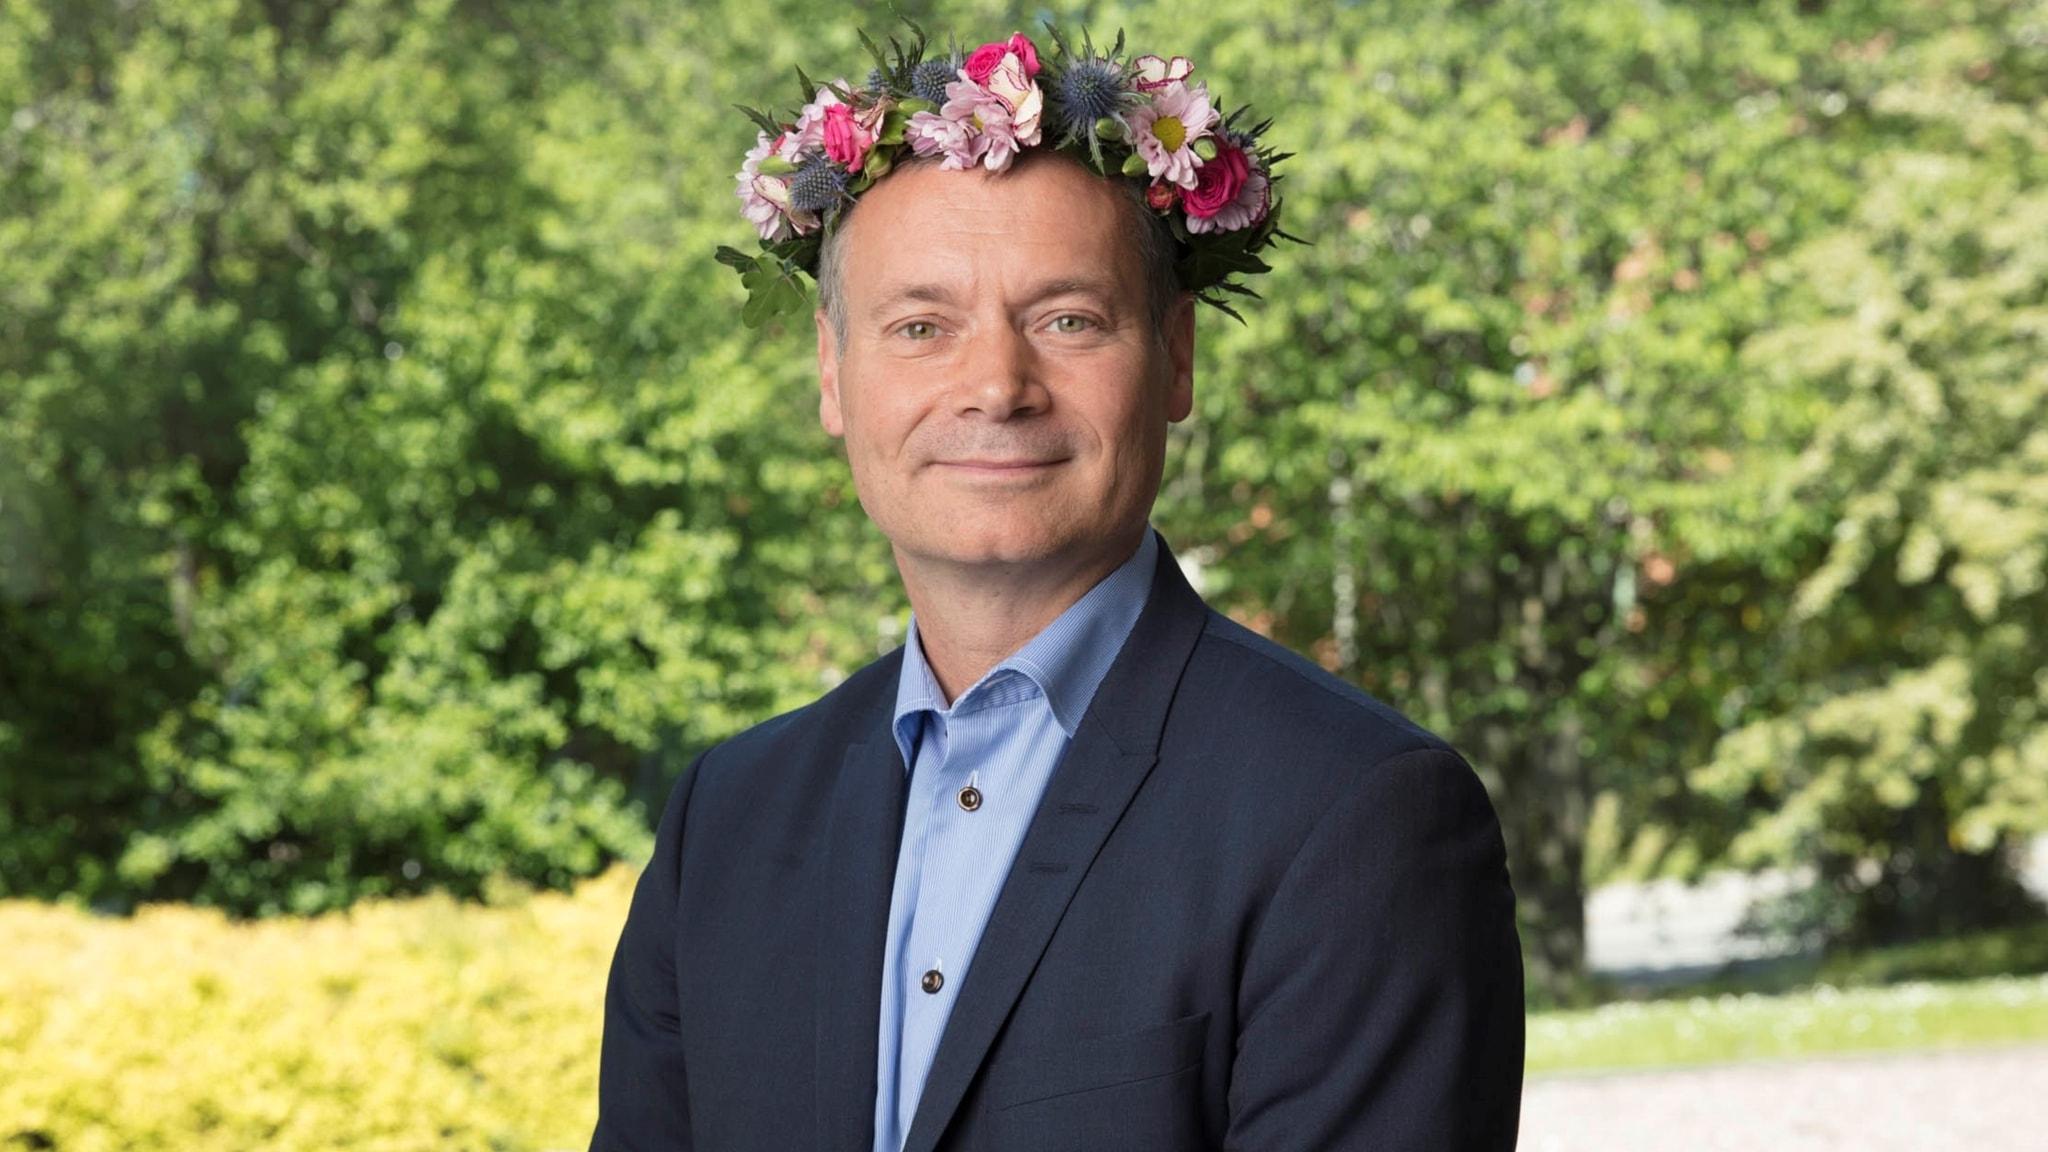 Johan Kuylenstierna